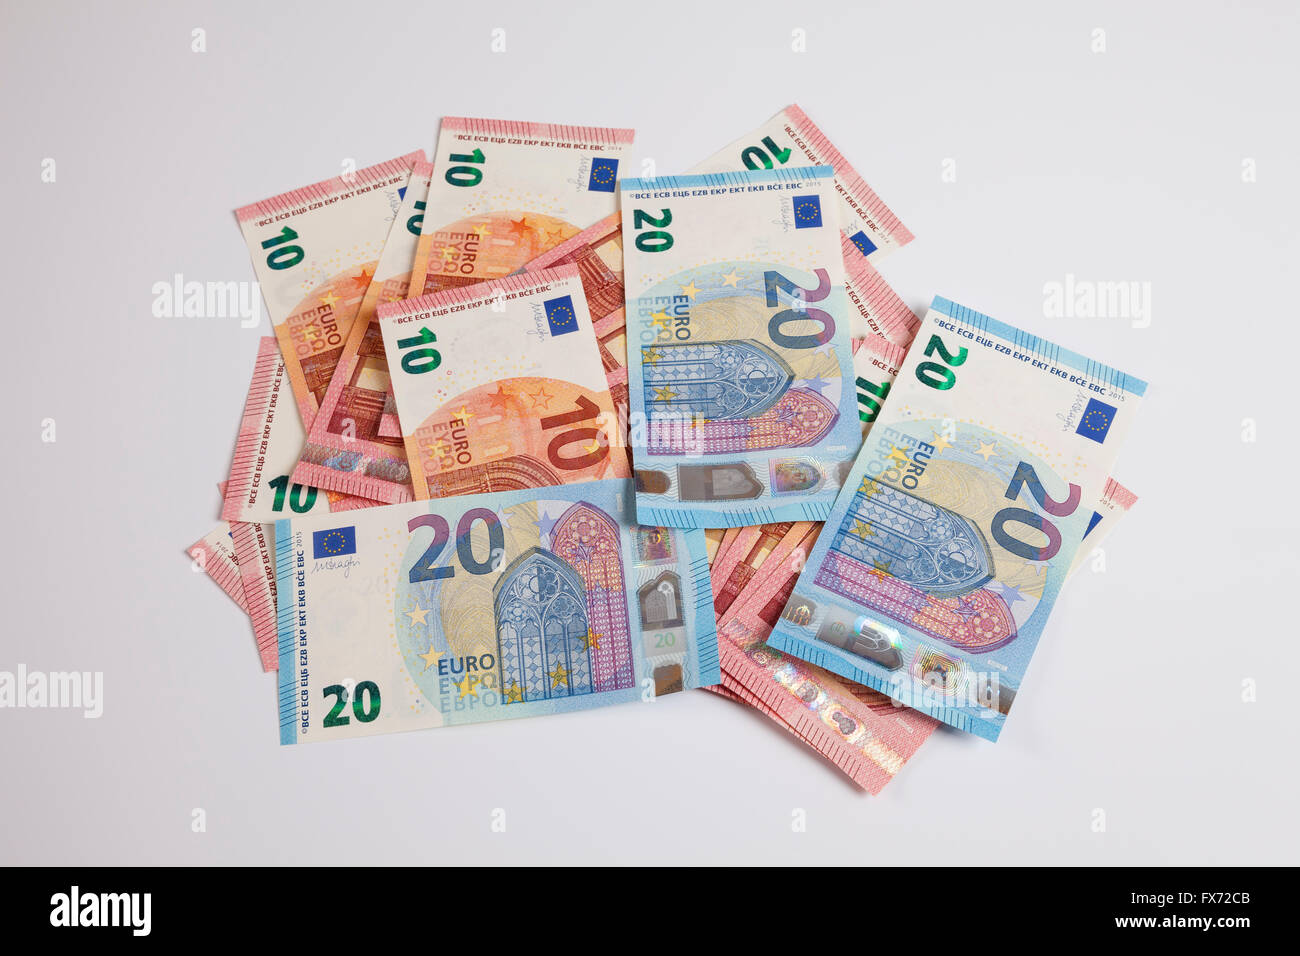 Bank notes, twenty Euros, release date 25/11/2015, ten Euros, release date 23/09/2014 - Stock Image